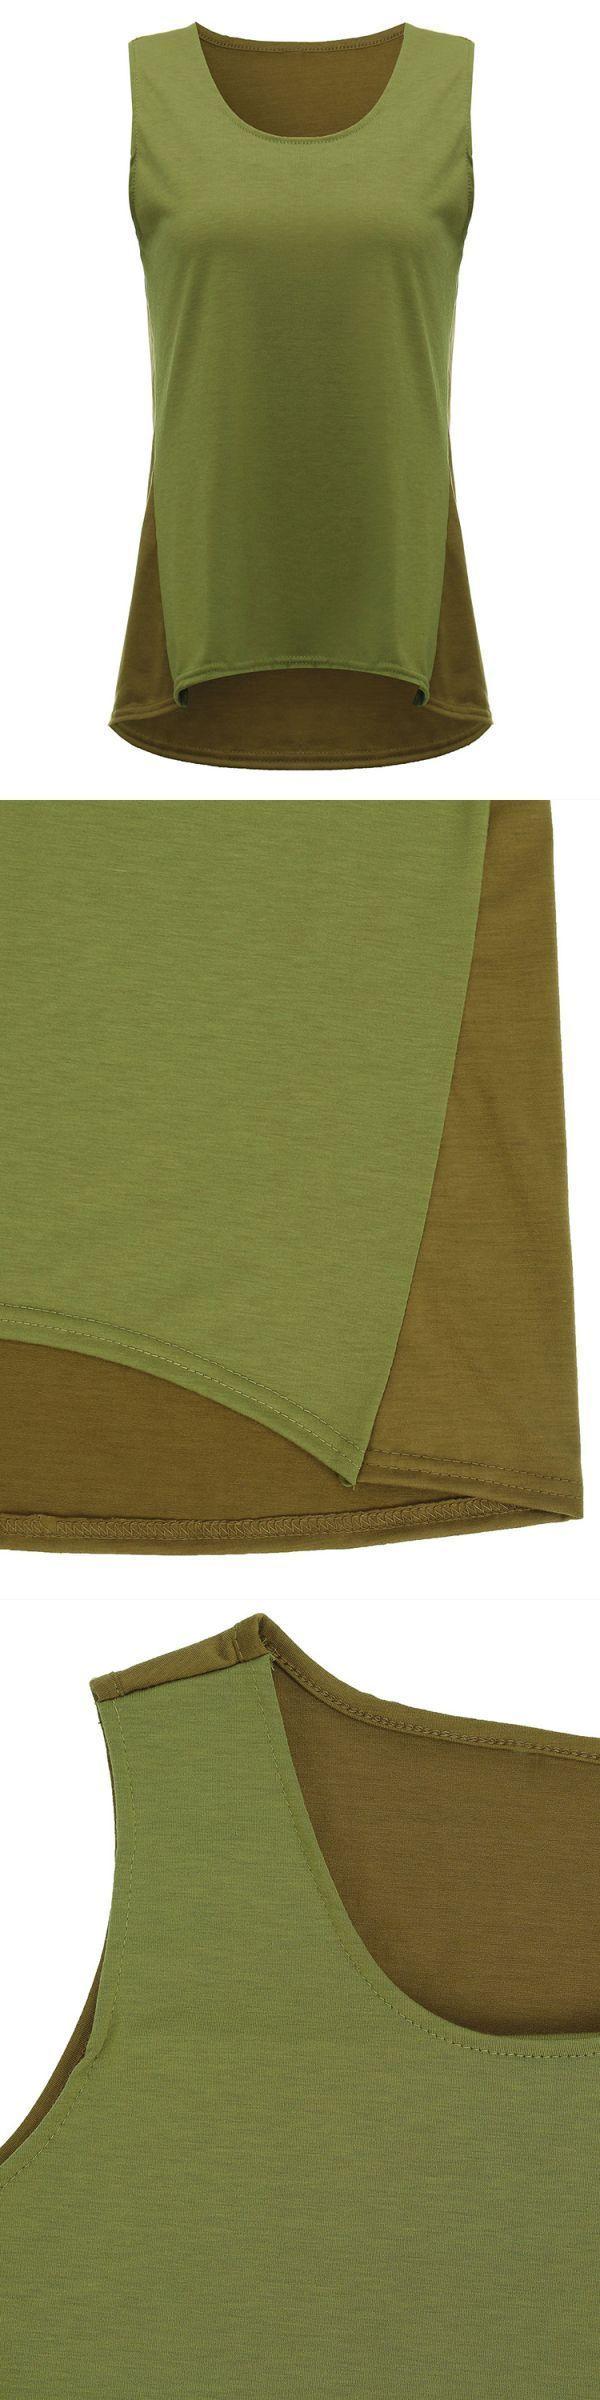 Slim women color block patchwork sleeveless tank top houston astros women#8217;s tank tops #tank #tops #womens #target #target #mossimo #womens #tank #tops #van #heusen #womens #tank #tops #womens #golf #tank #tops